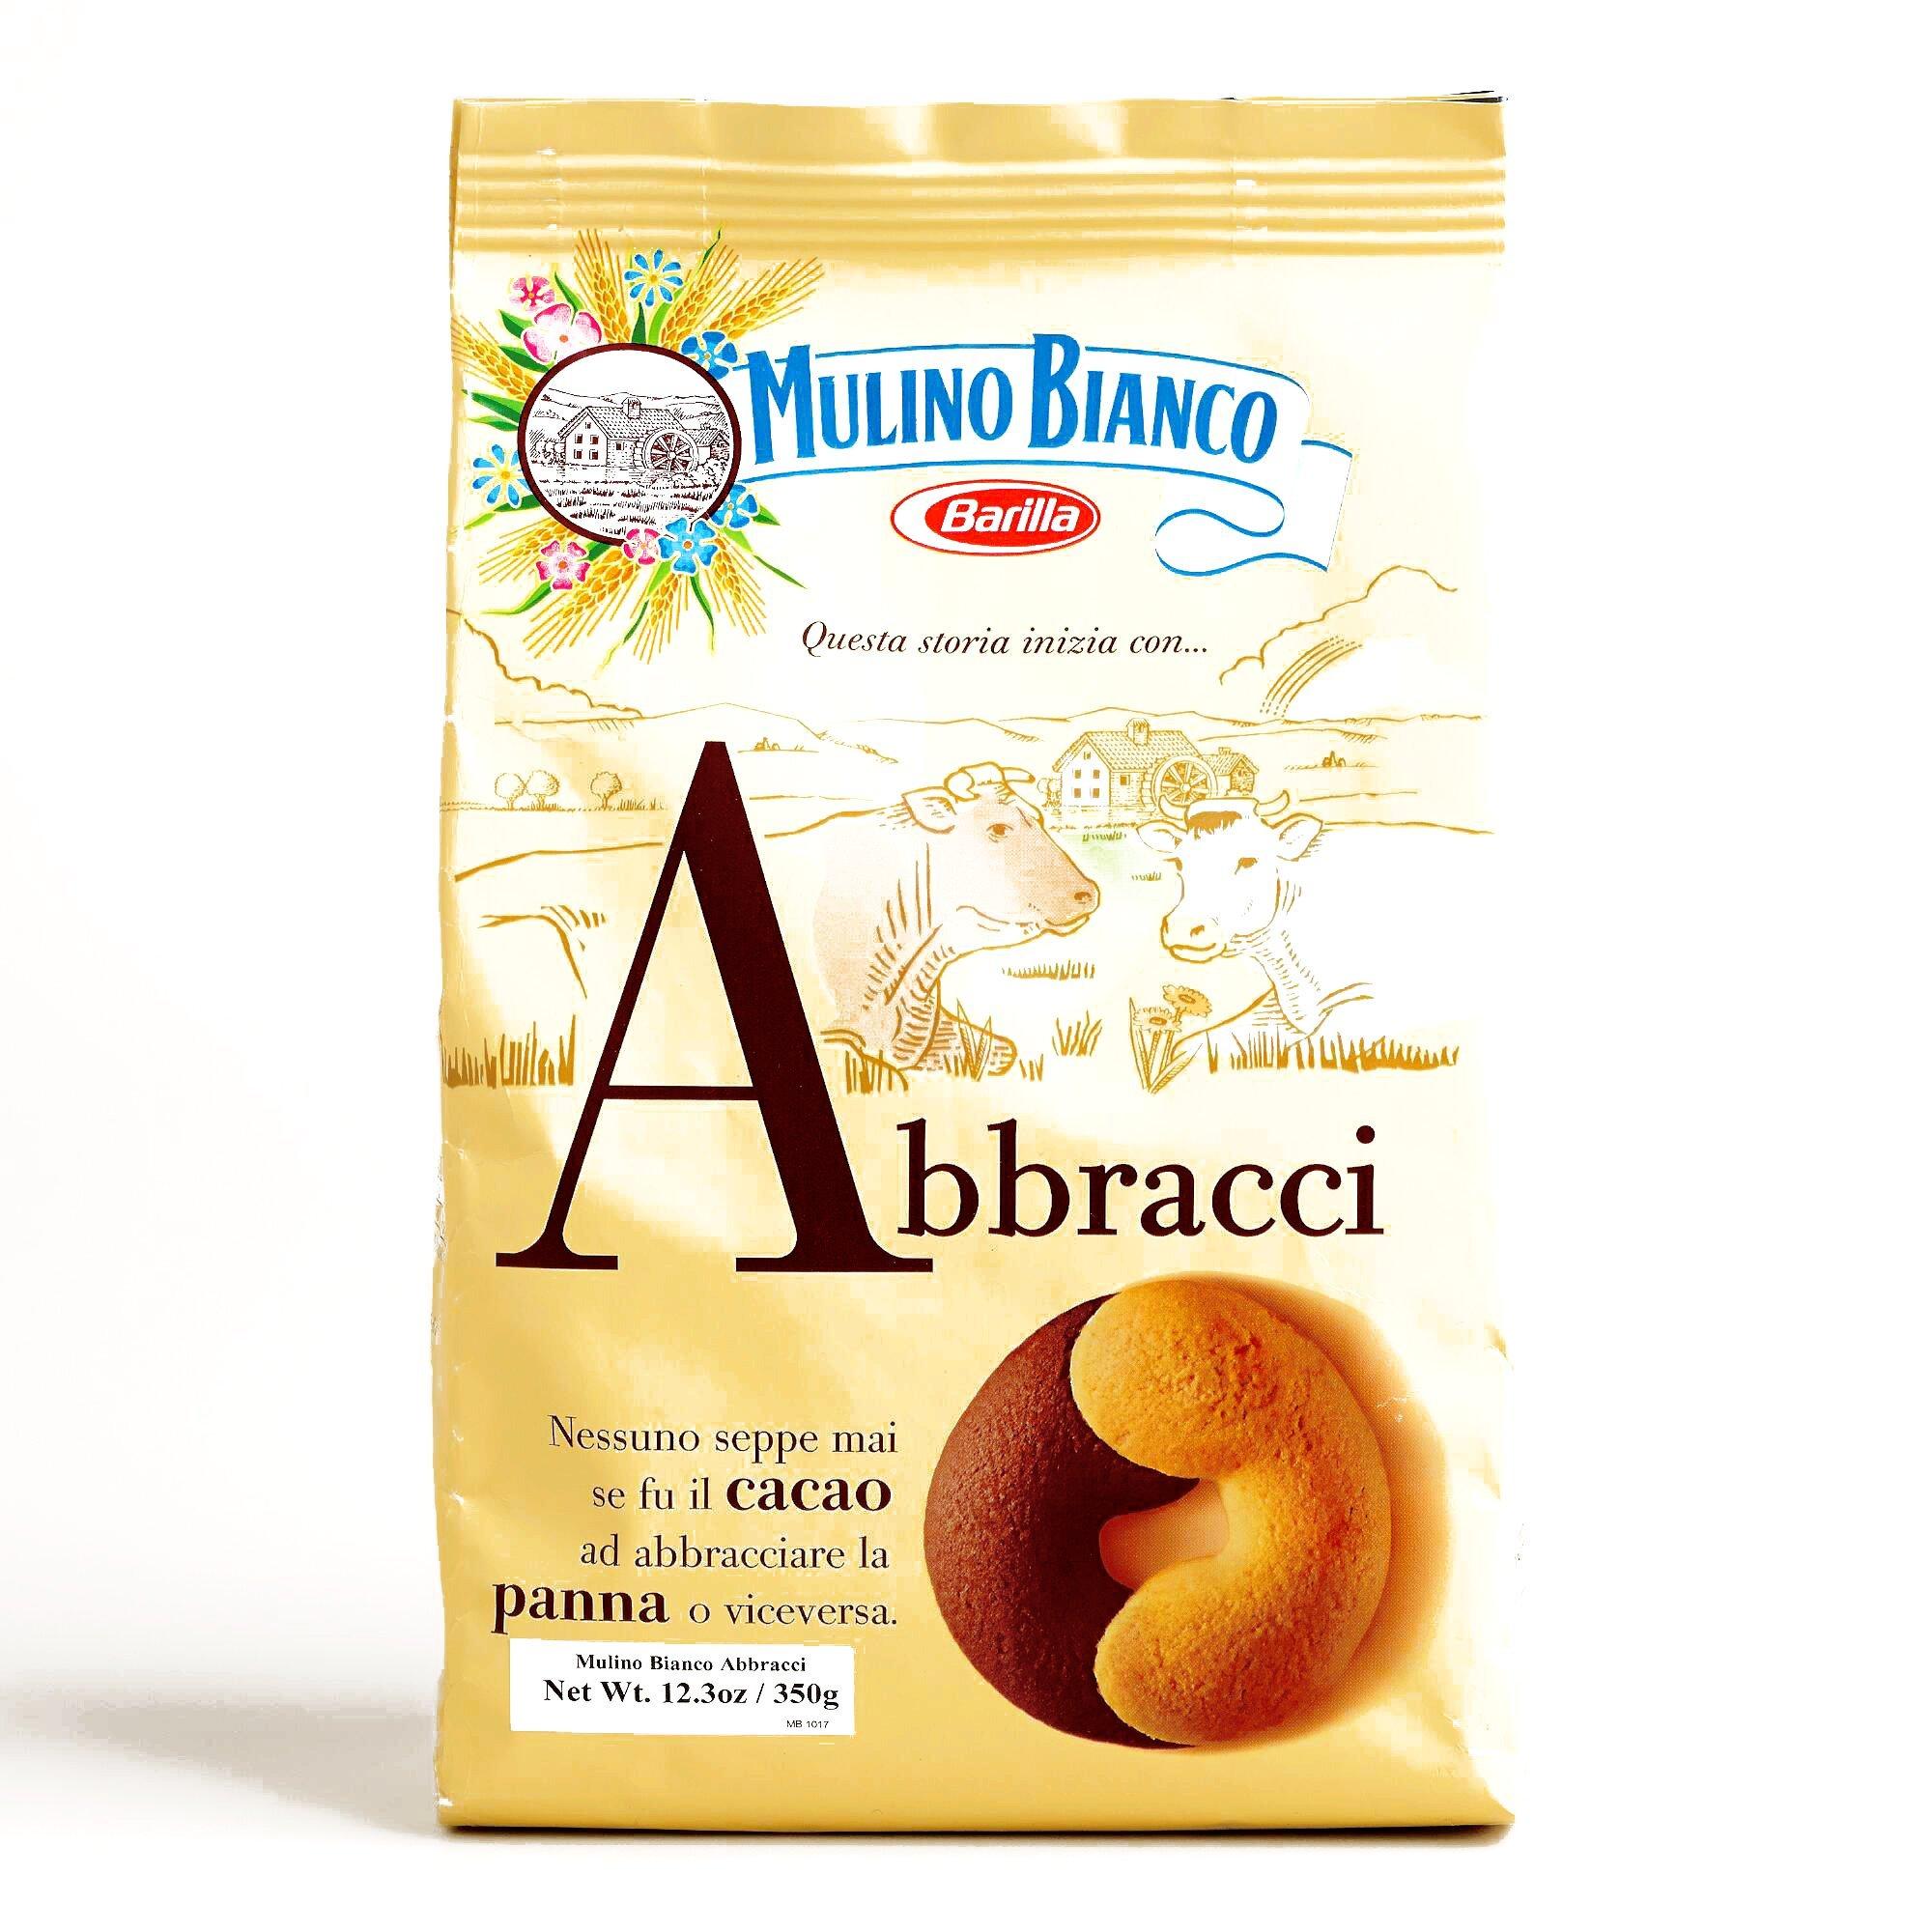 Mulino Bianco Abbracci Cookies 12.3 oz each (1 Item Per Order)